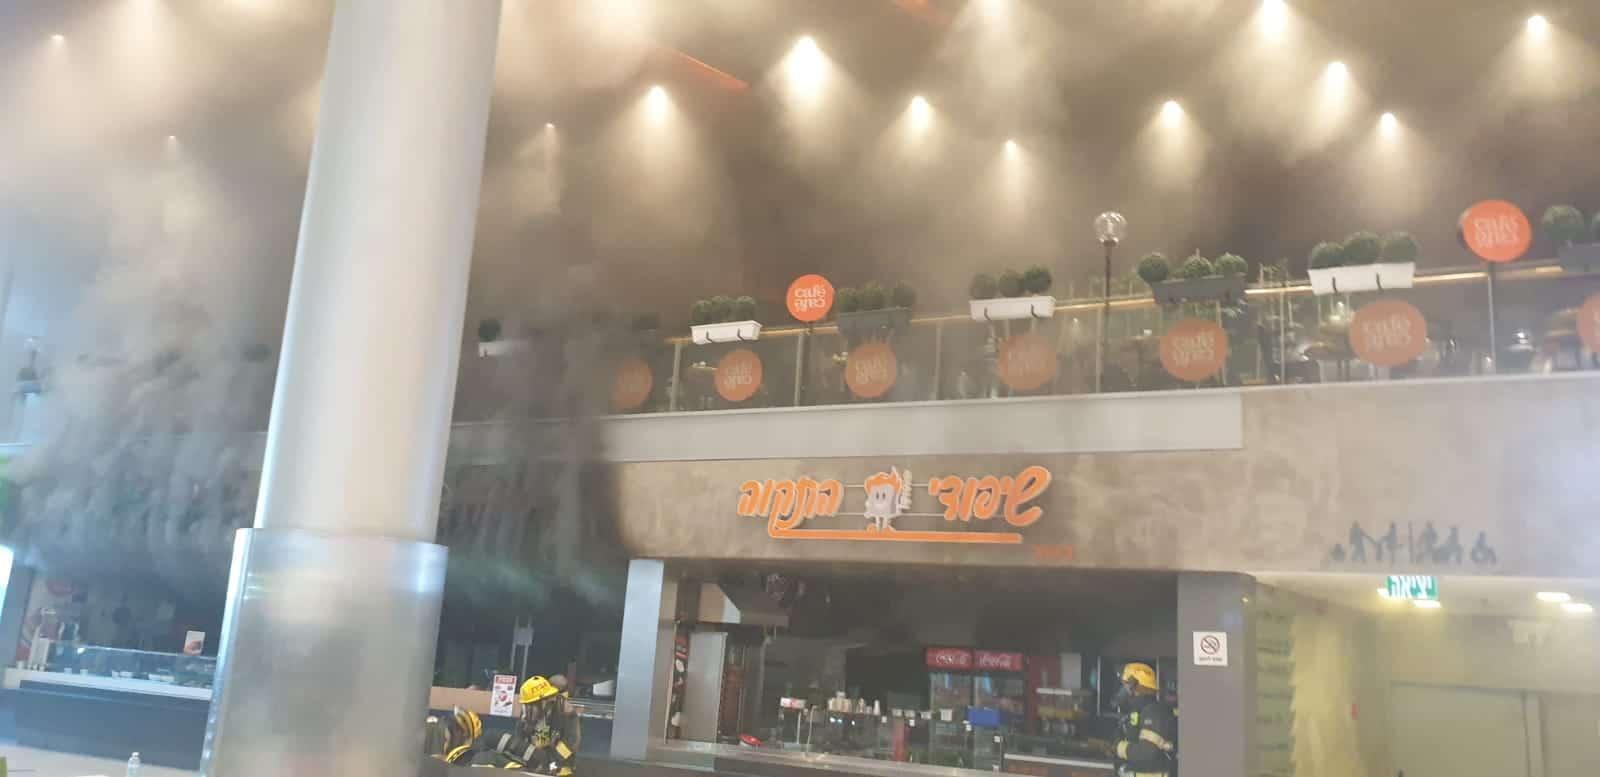 שריפה בקניון איילון